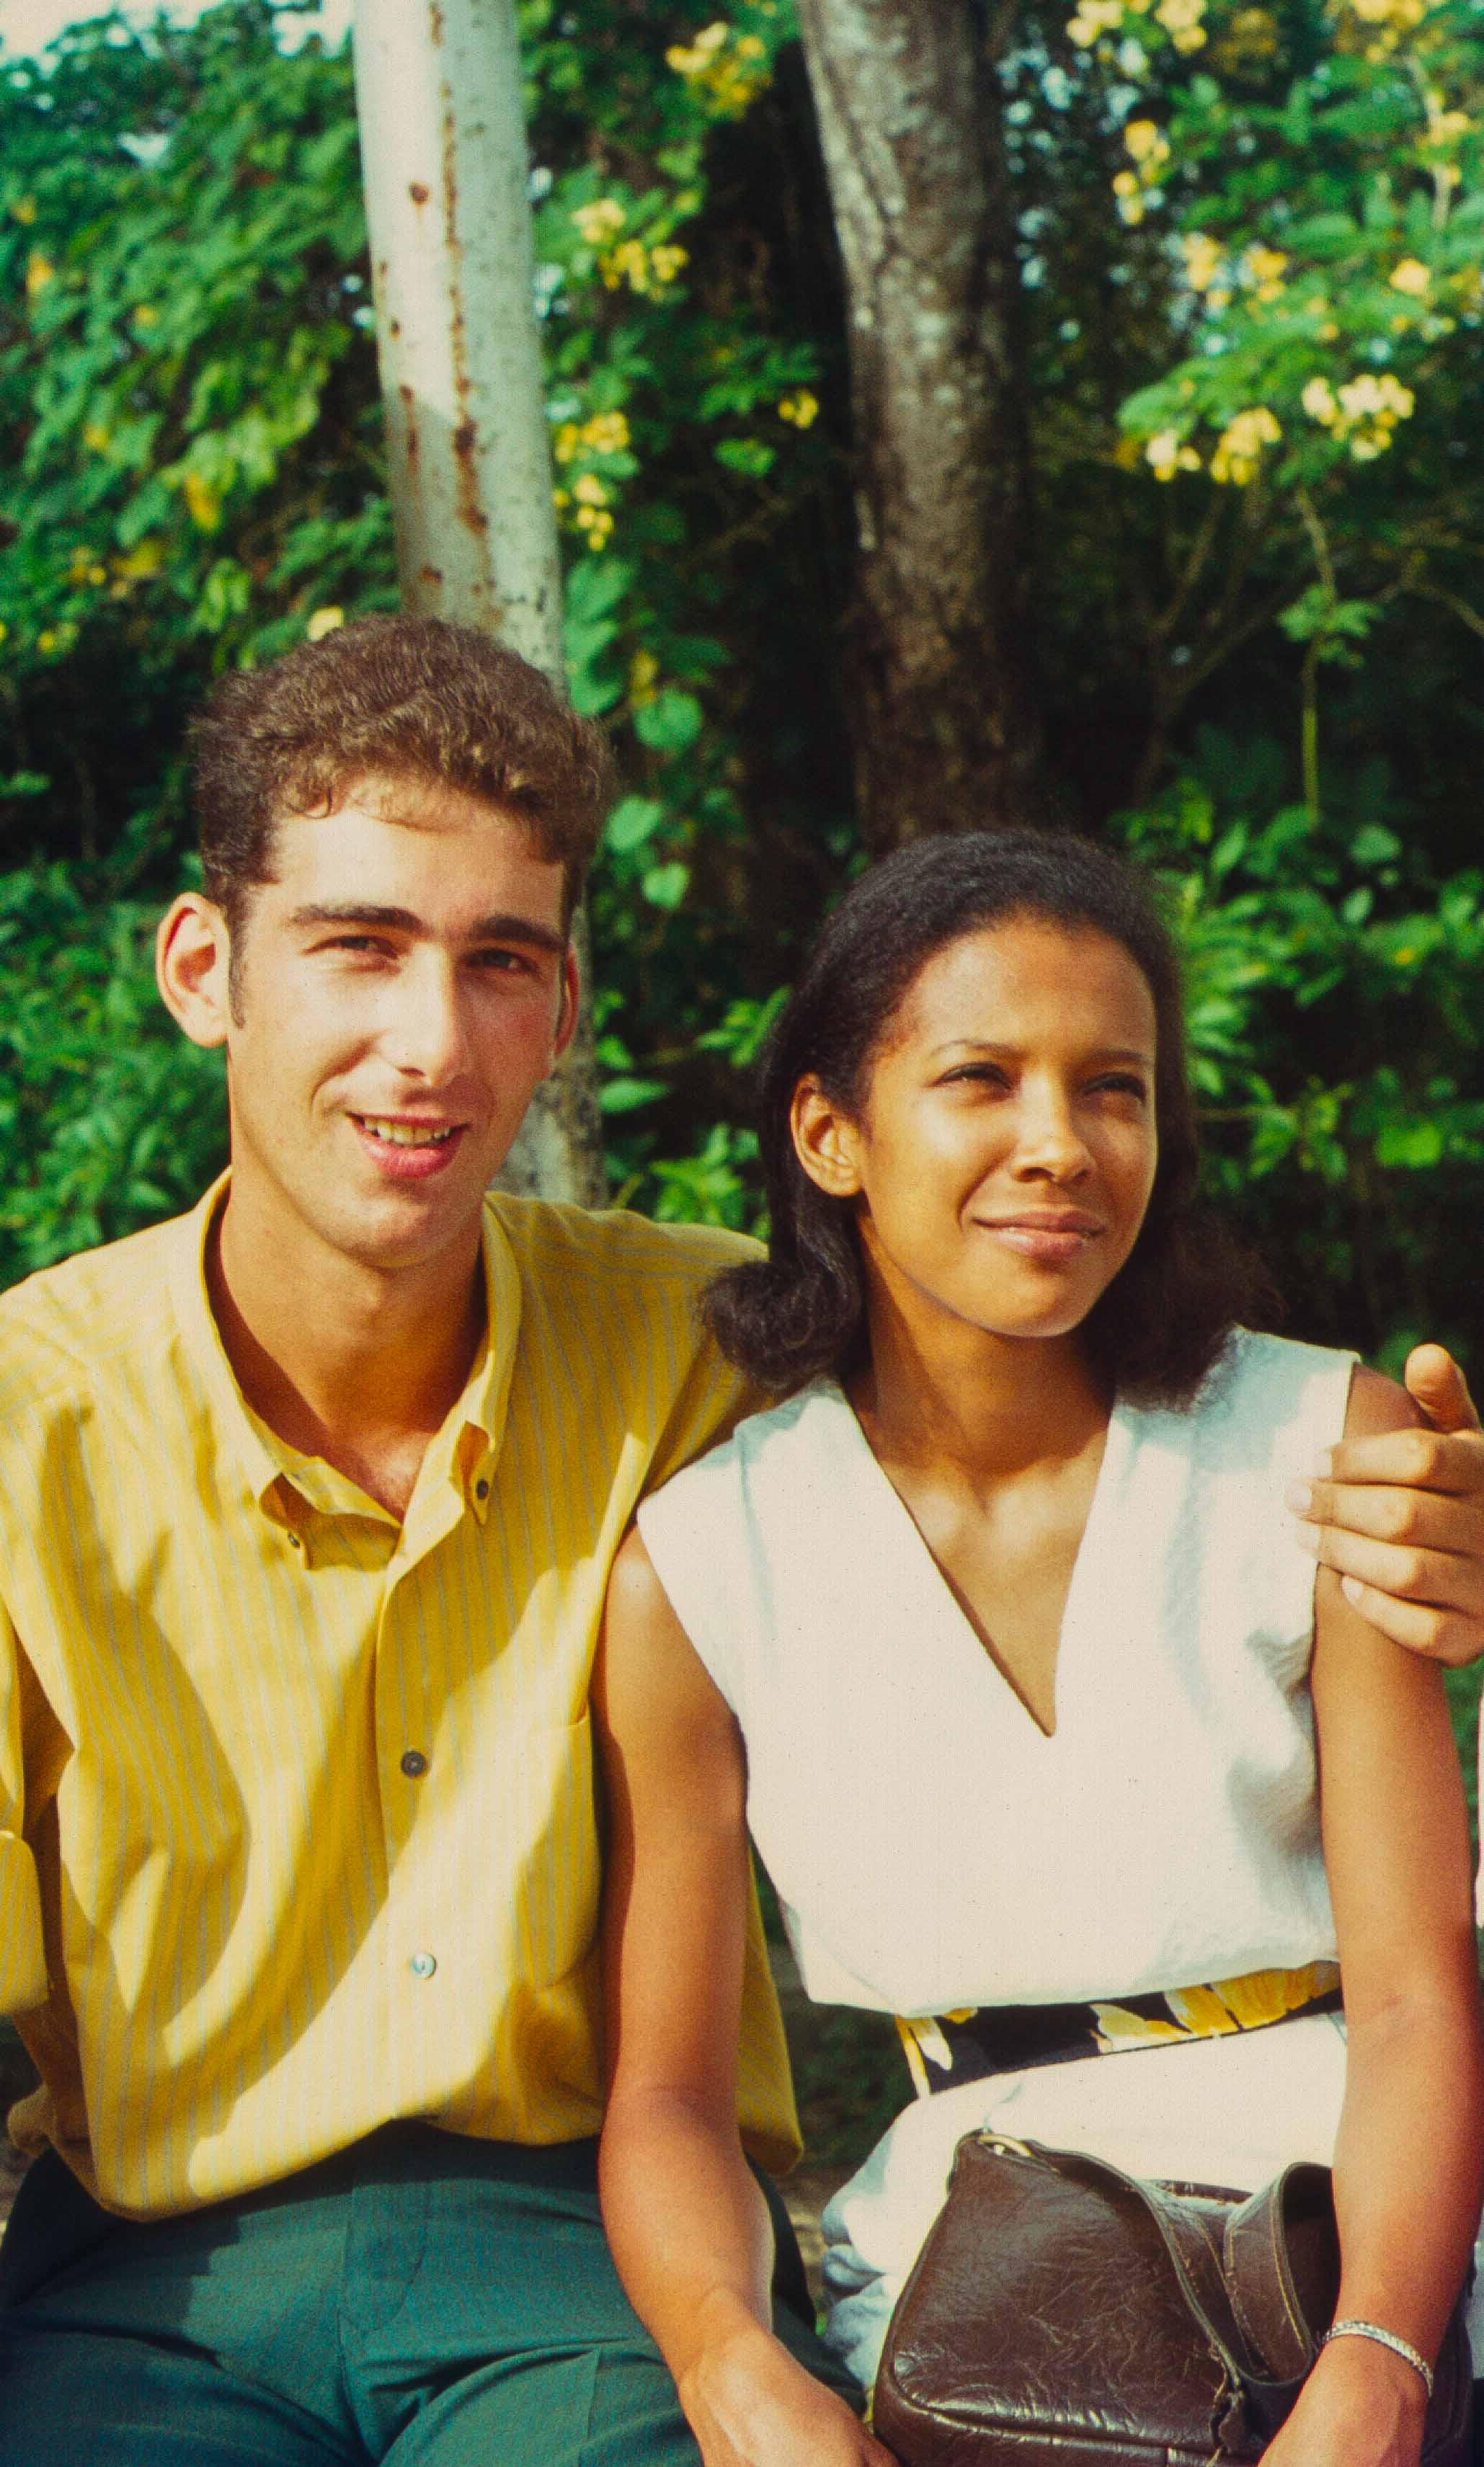 181. Suriname